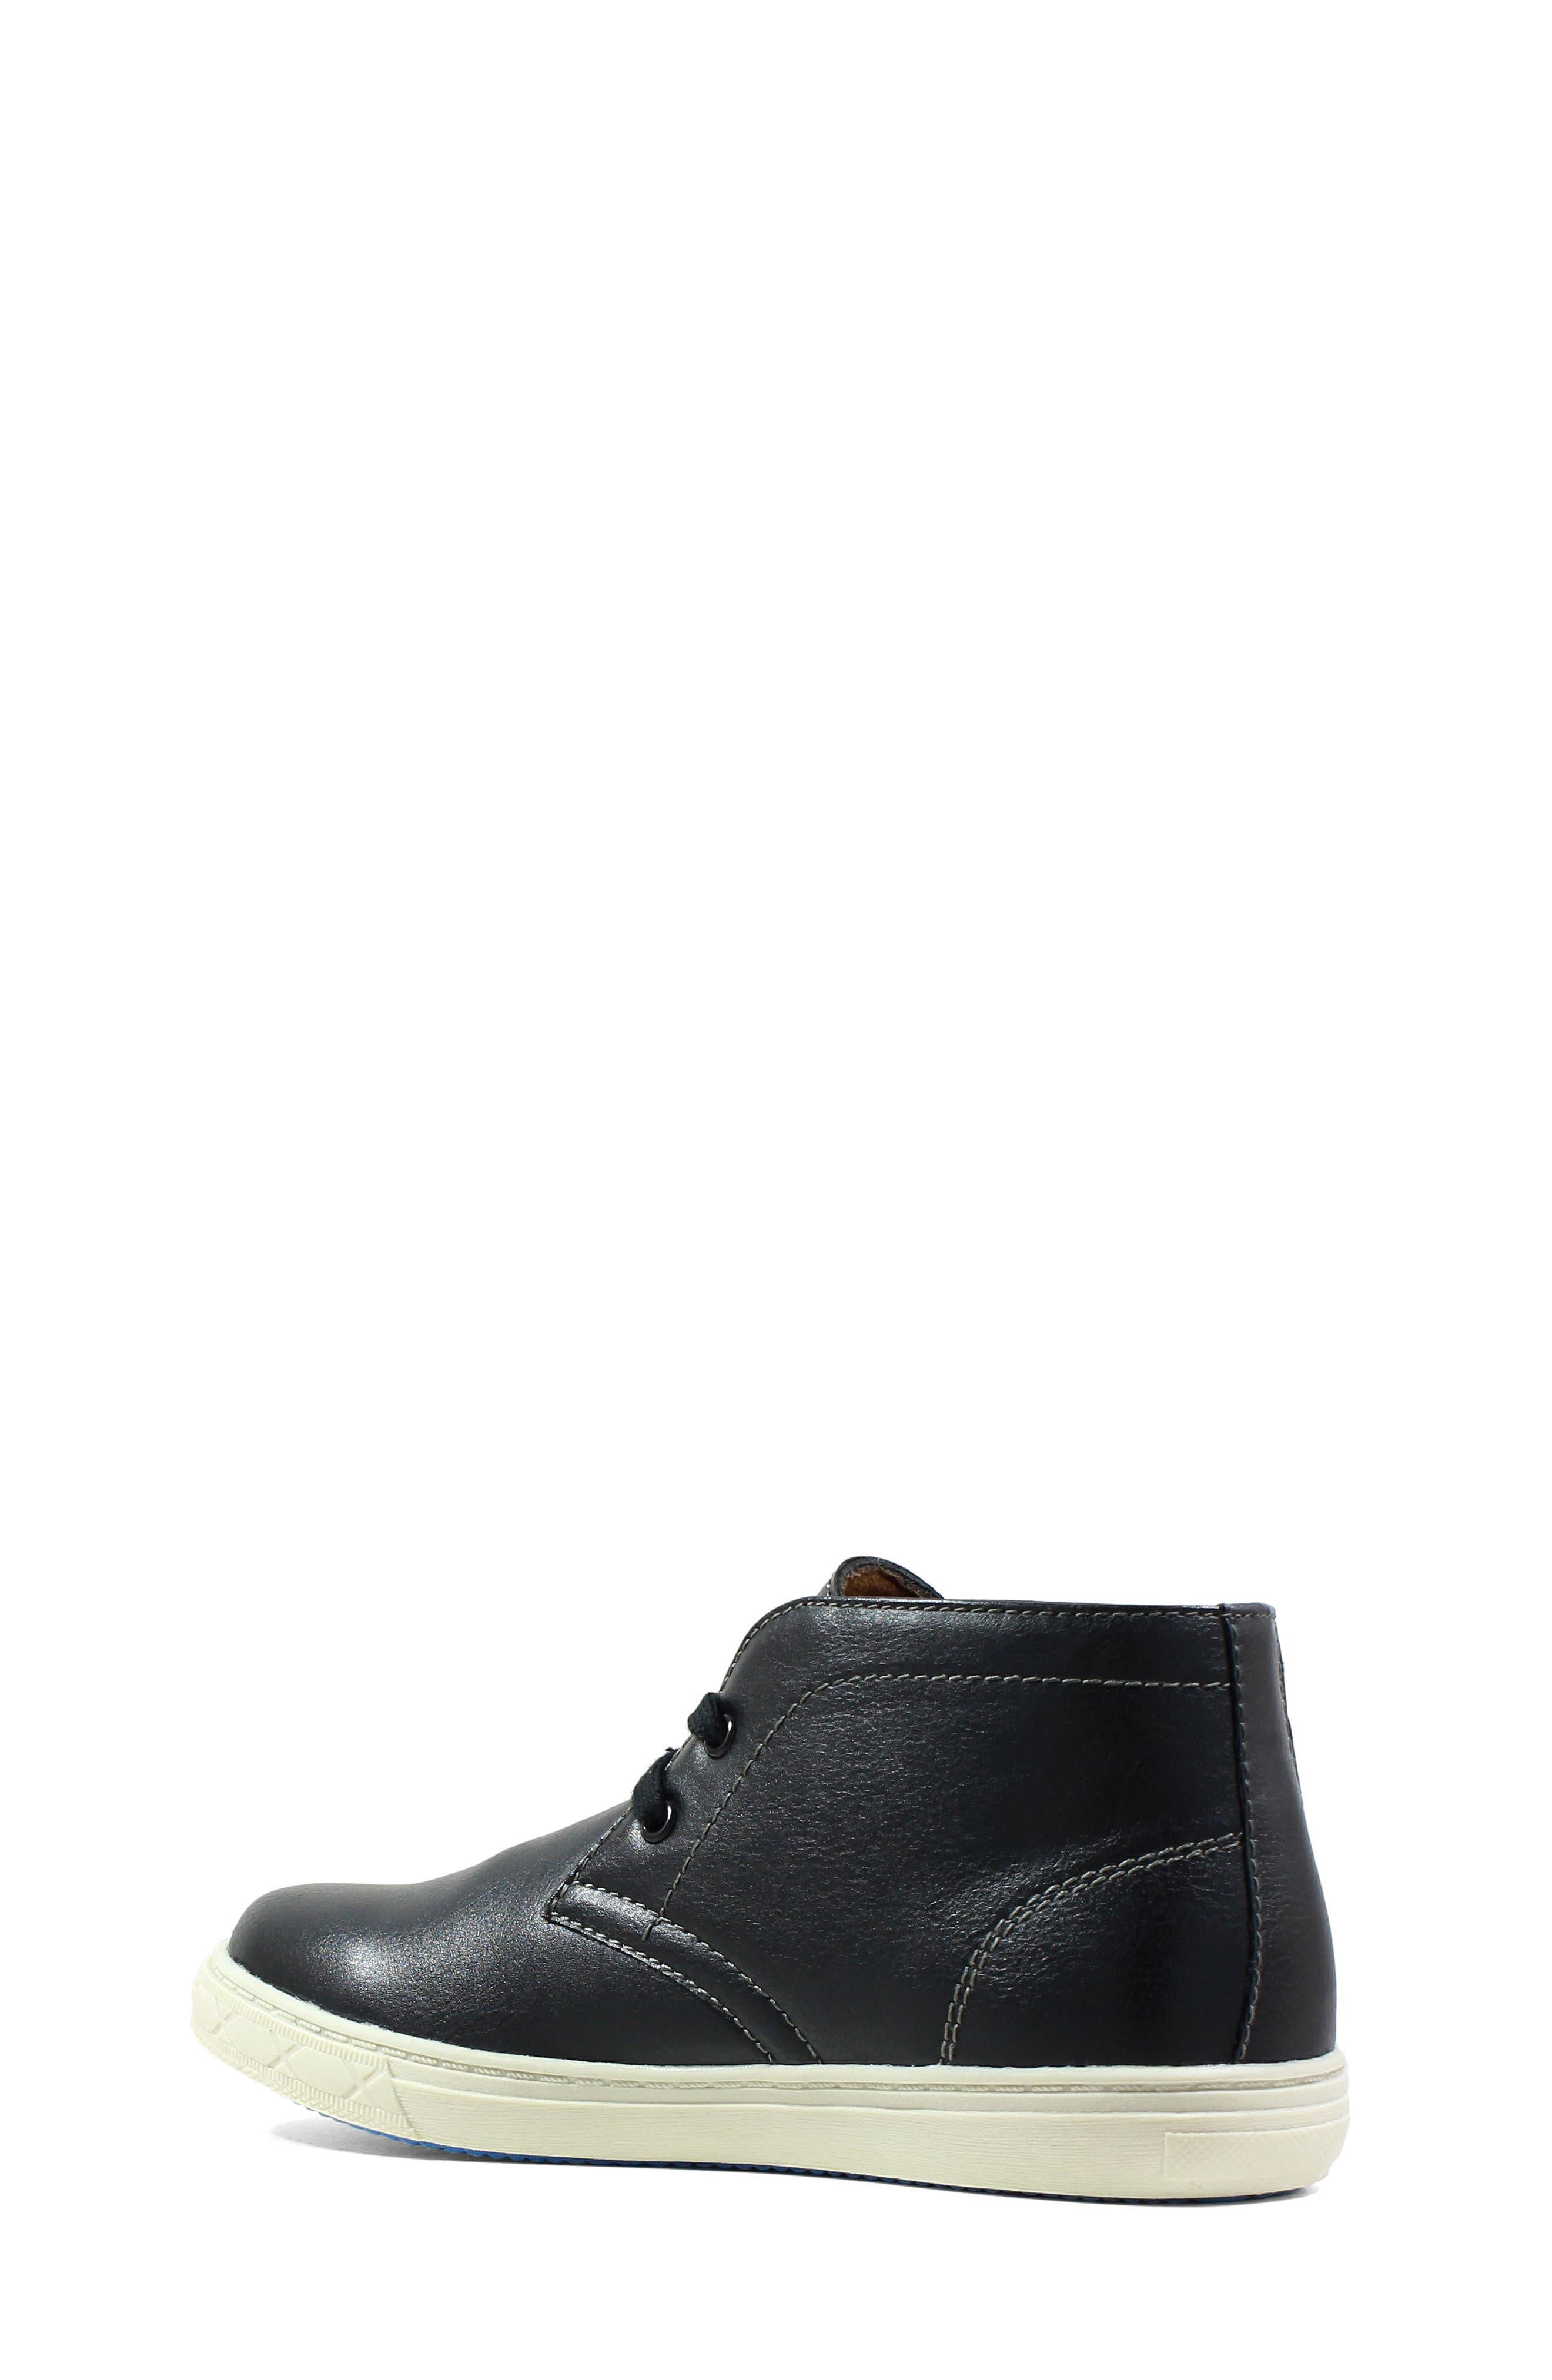 Curb Chukka Sneaker Boot,                             Alternate thumbnail 2, color,                             BLACK